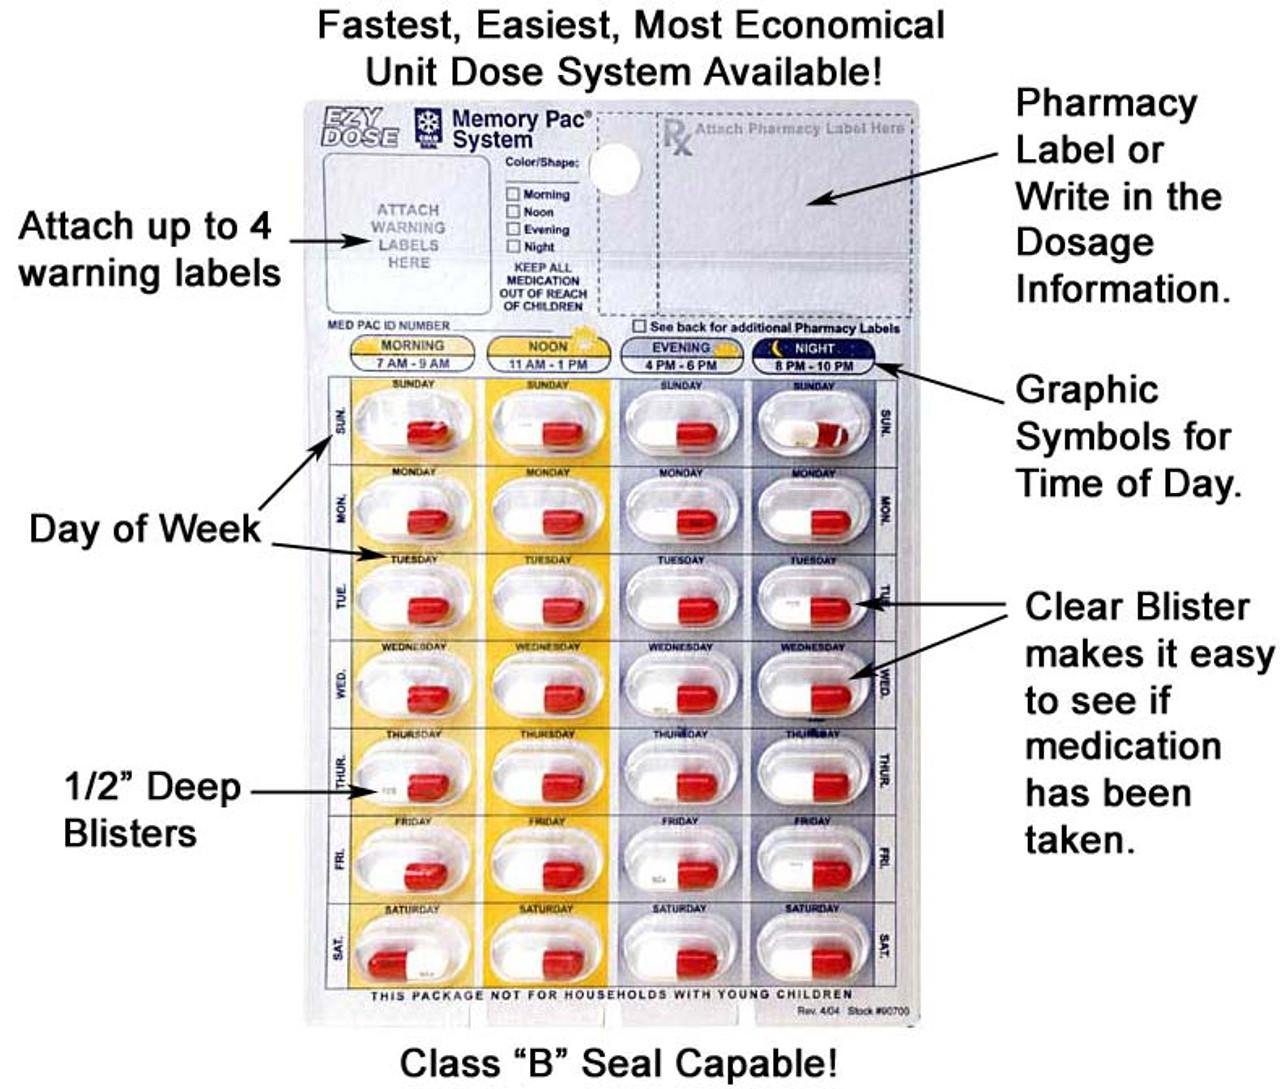 Make your own custom made pill organizer blister packs at home!